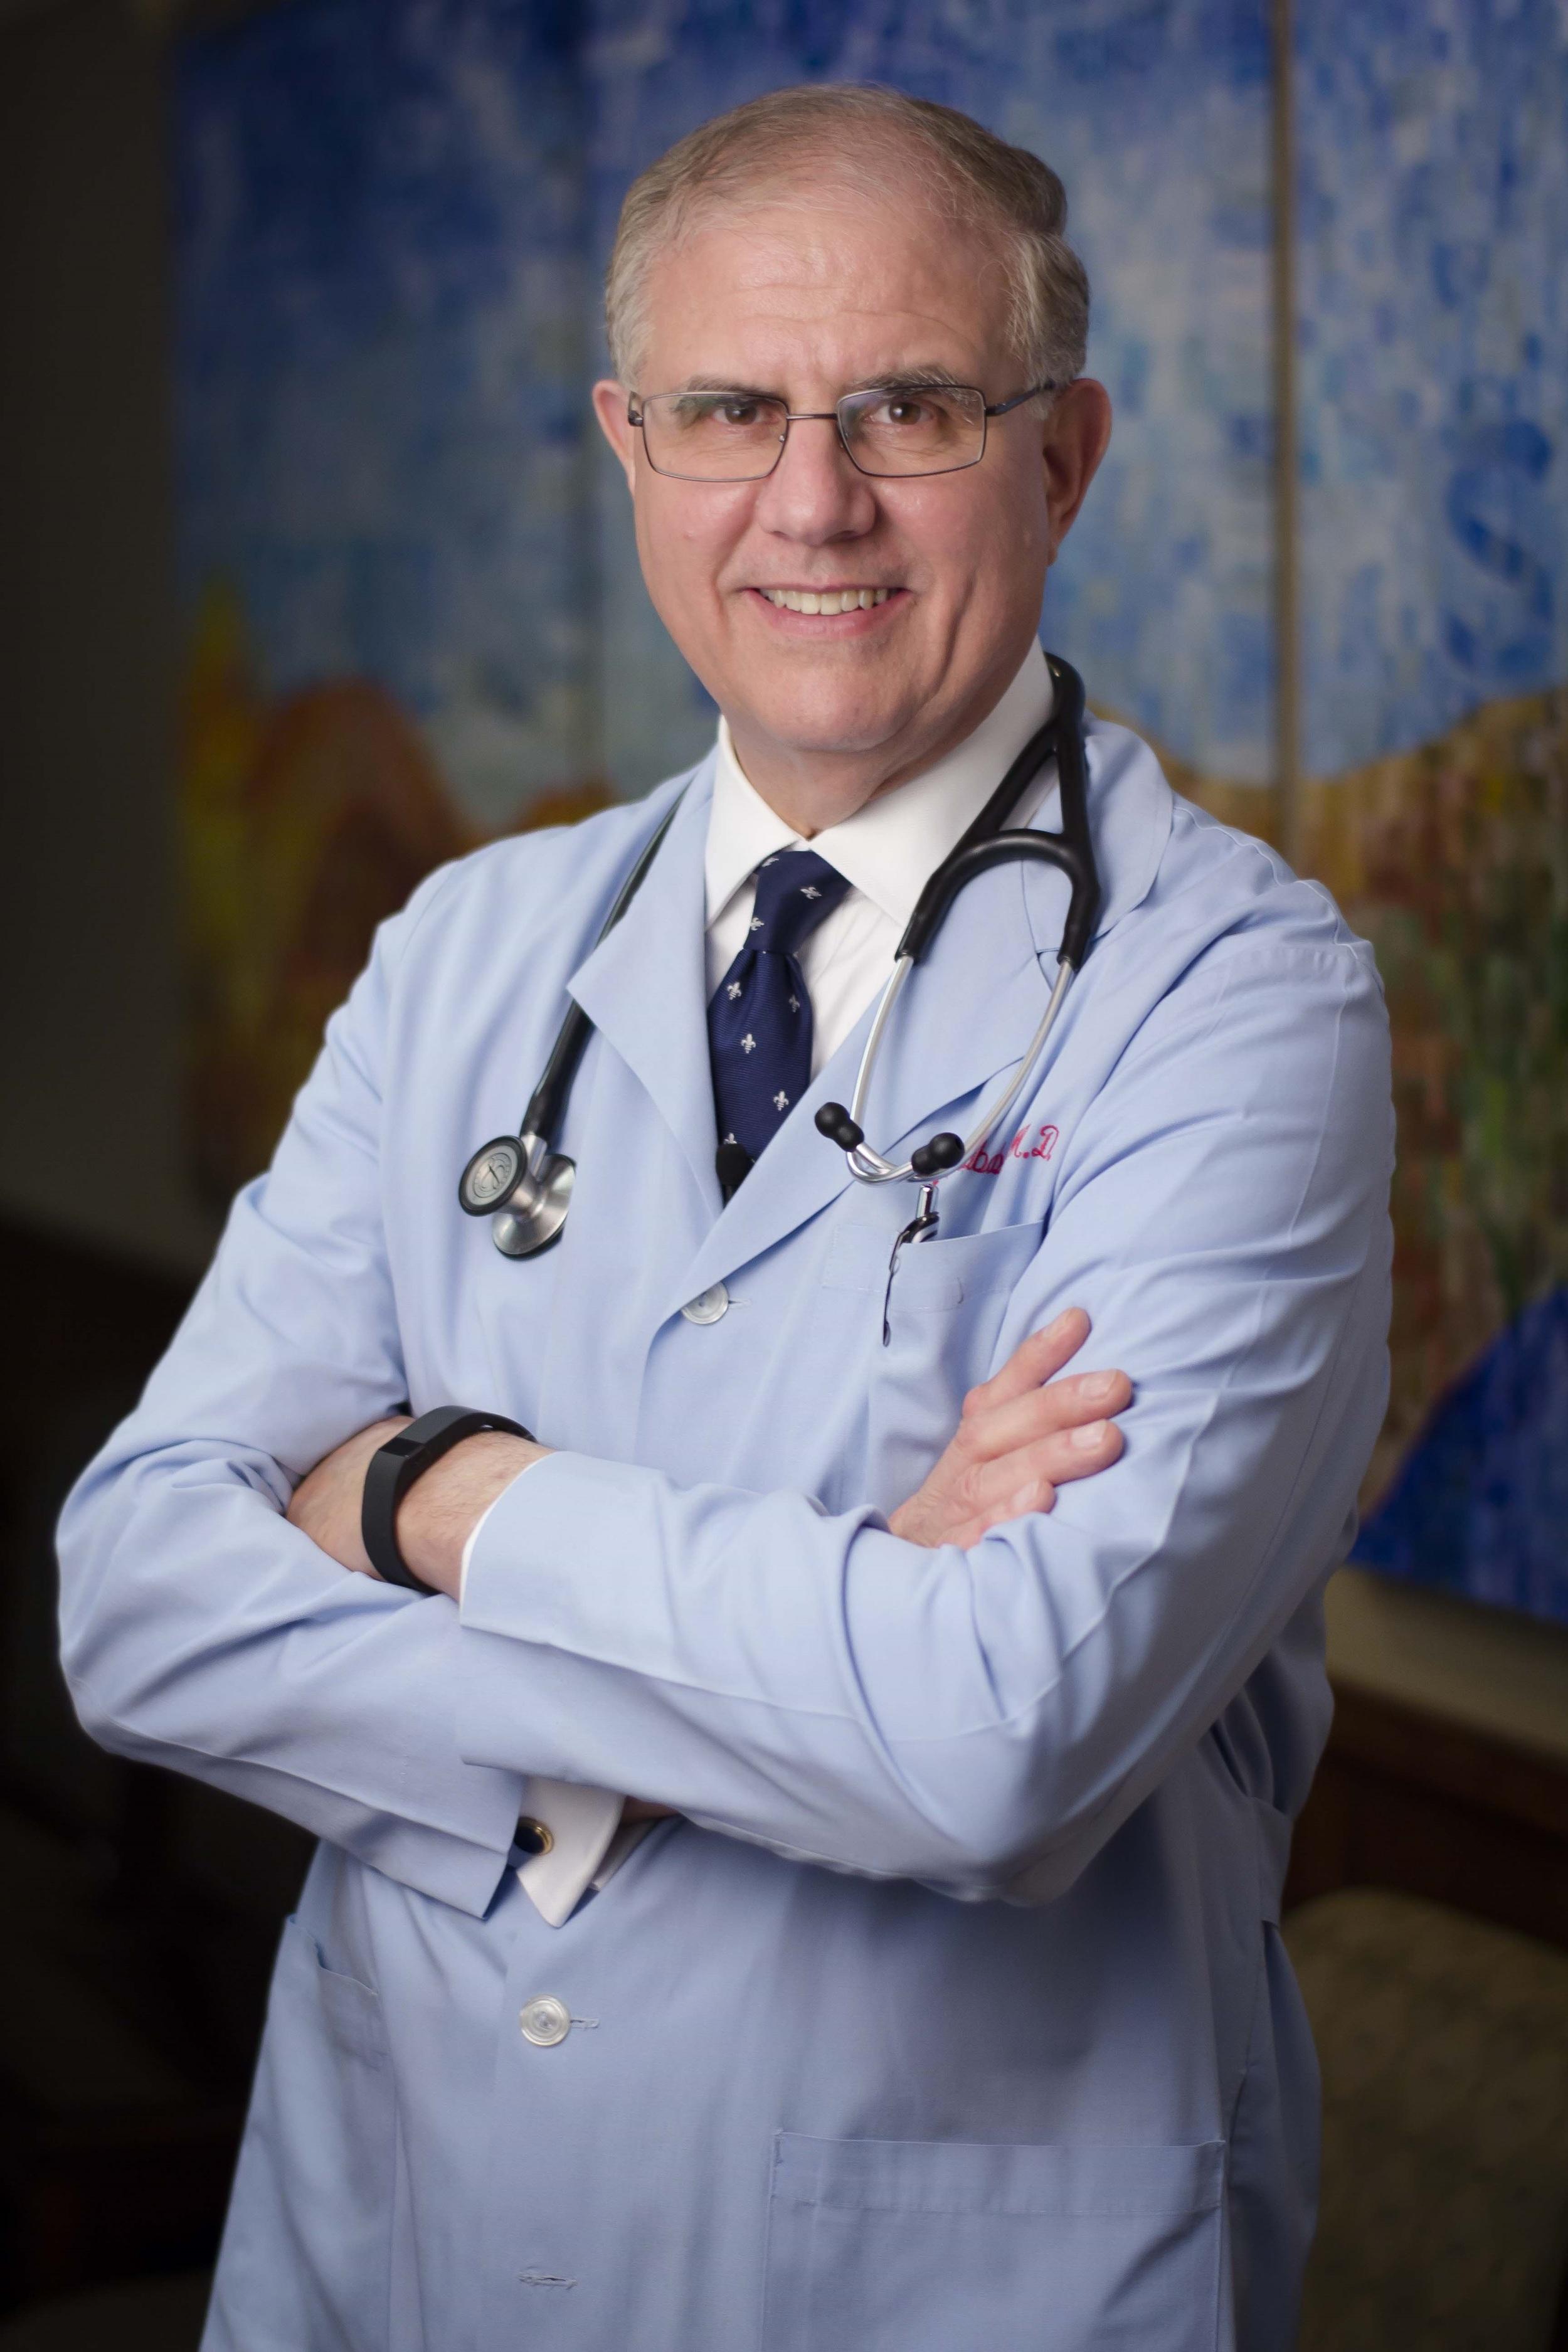 Dr. Scott J. Kolbaba Author Biography